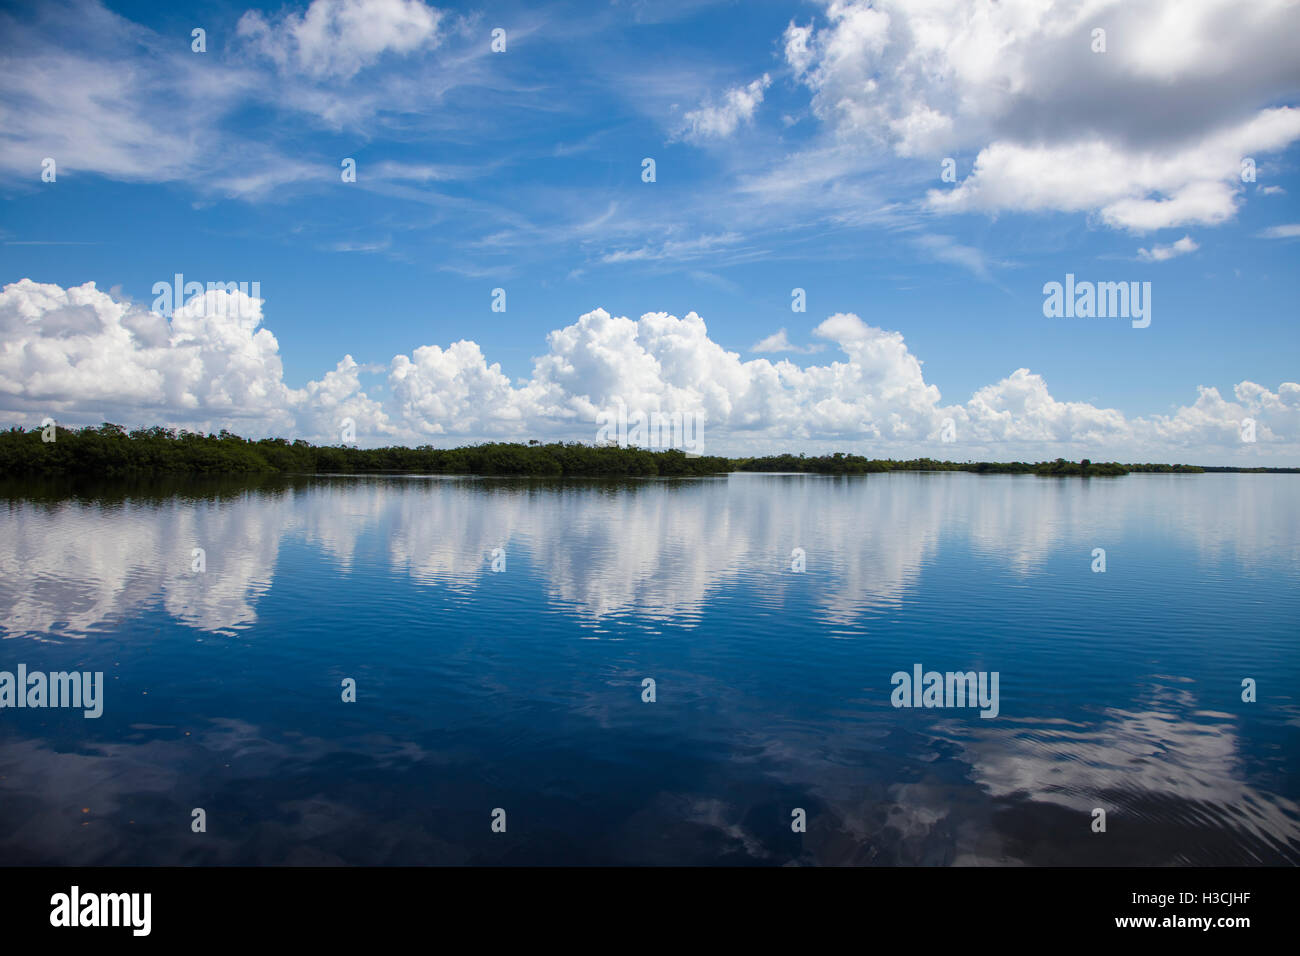 Clouds reflecting in calm water in J N Ding Darling National Wildlife Refuge on Sanibel Island Florida - Stock Image